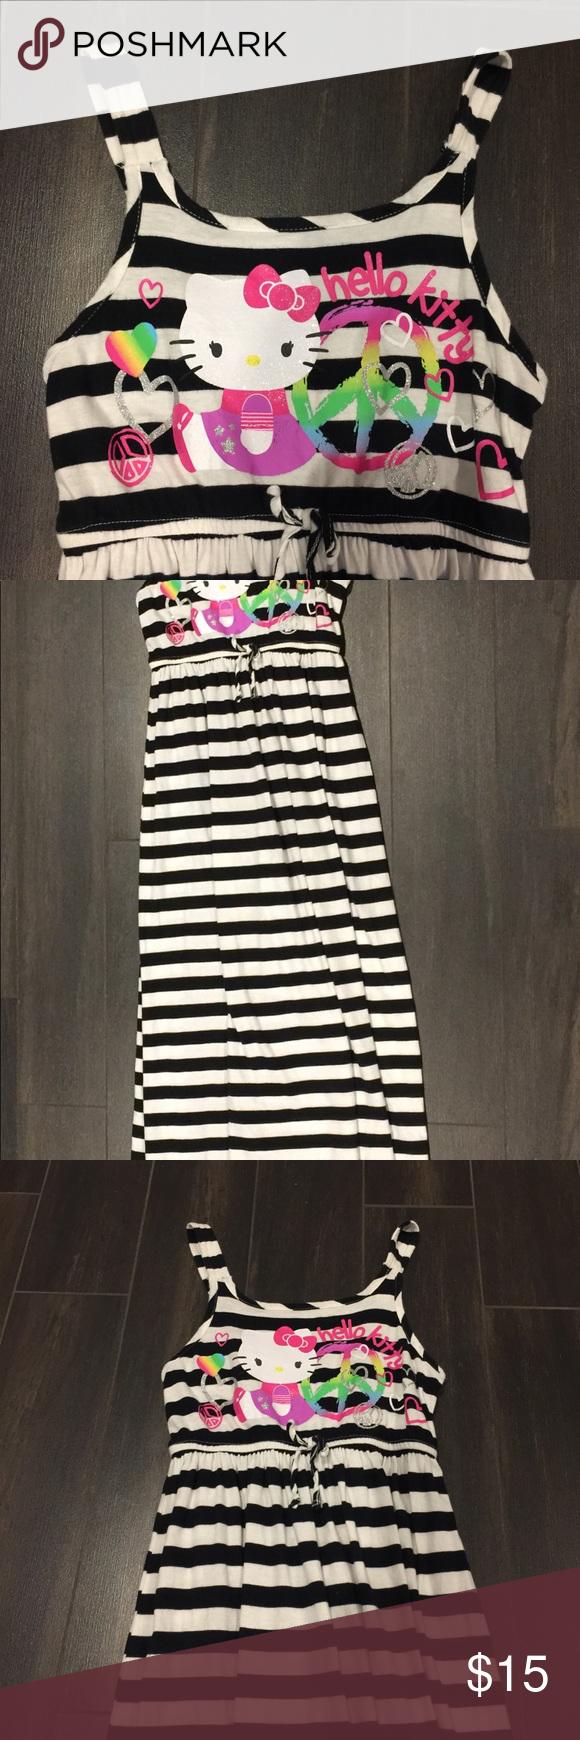 b9ebaf443 Hello Kitty Stripped Maxi Dress 7/8 Hello Kitty Maxi Dress Black and White  Stripped 7/8 Hello Kitty Dresses Casual